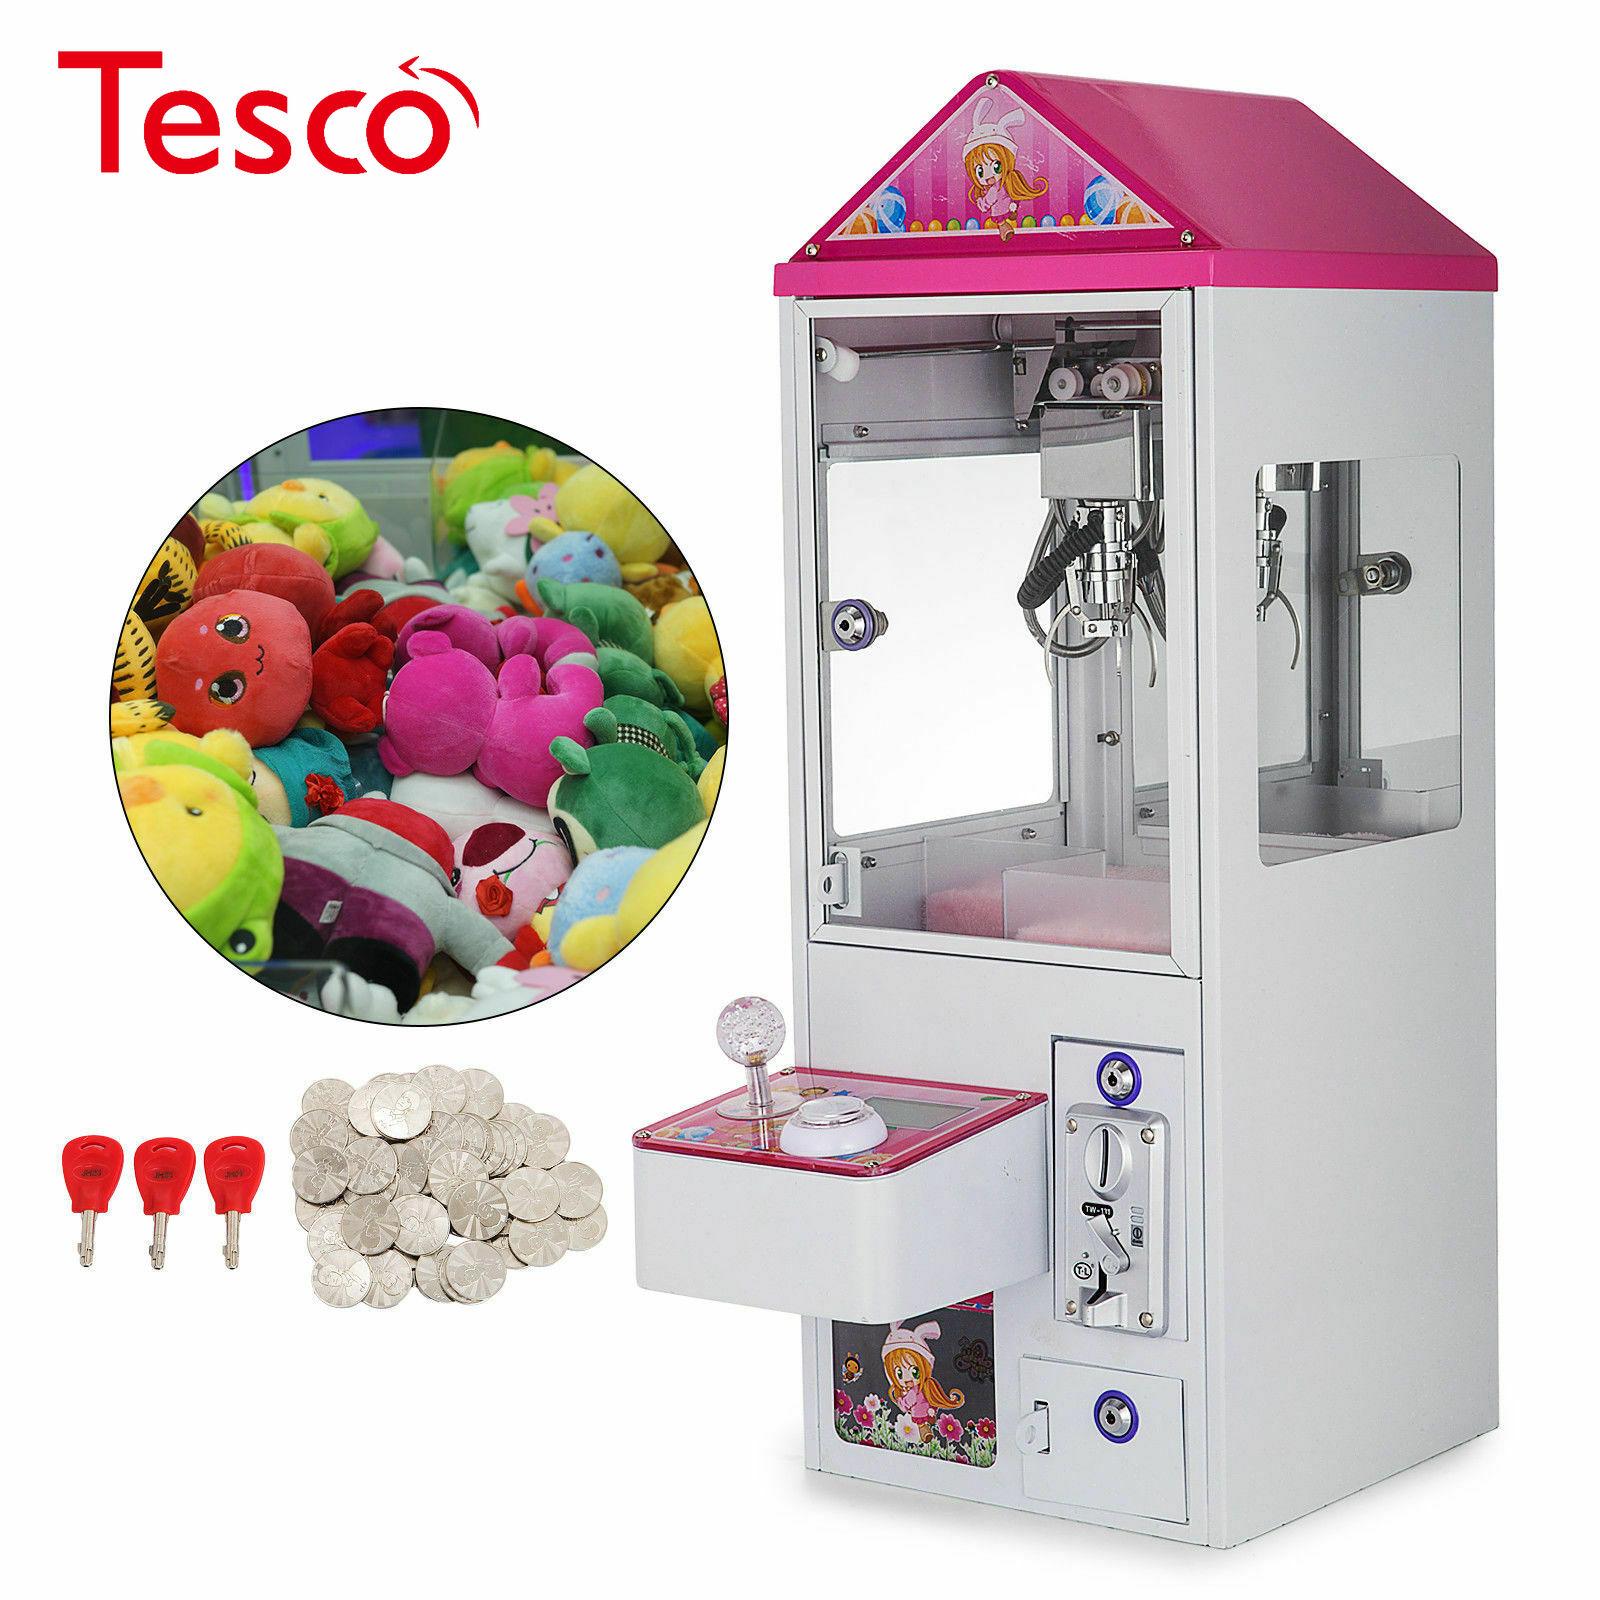 Mini garra grúa máquina caramelo juguete recogedor Carnival Charge Play Mall 110V